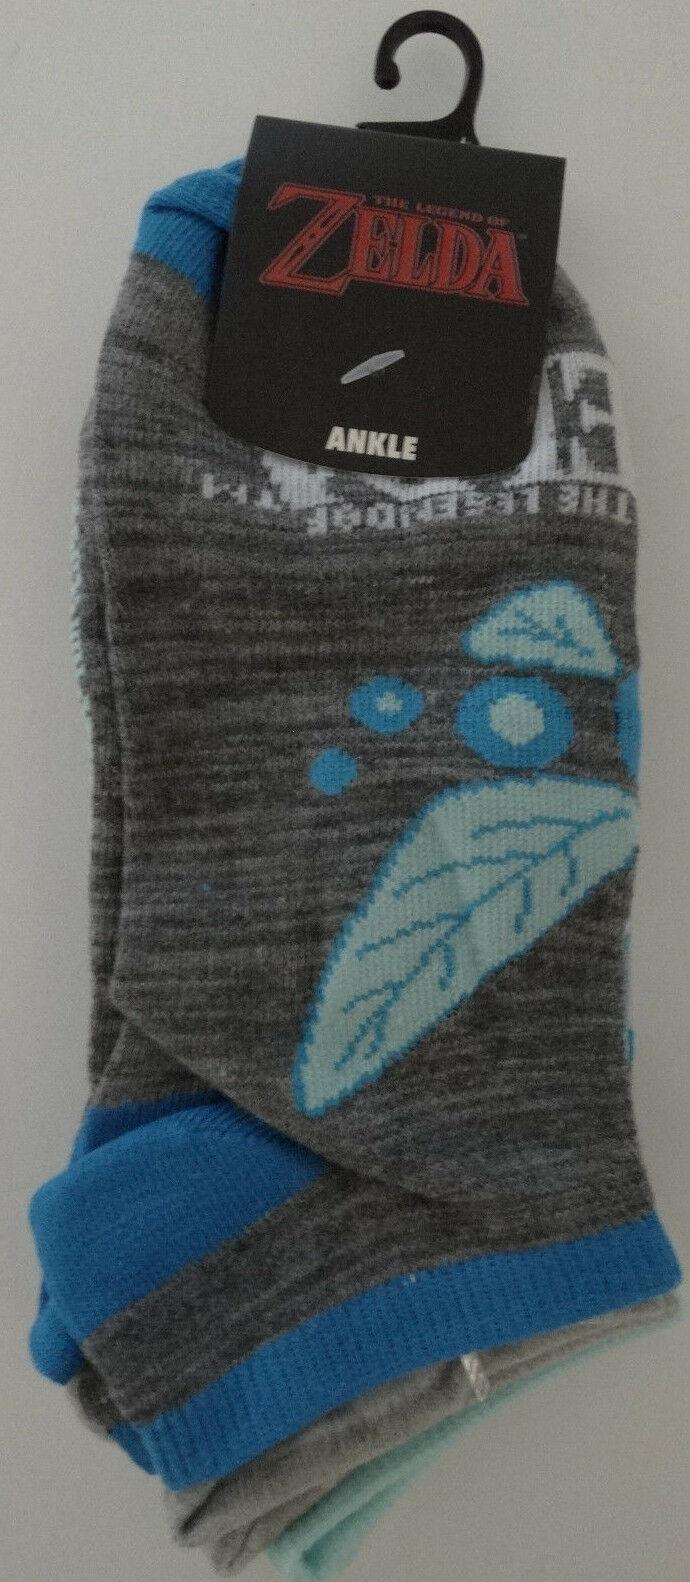 The Legend Of Zelda Video Game 3 Pack Ankle Socks Nwt